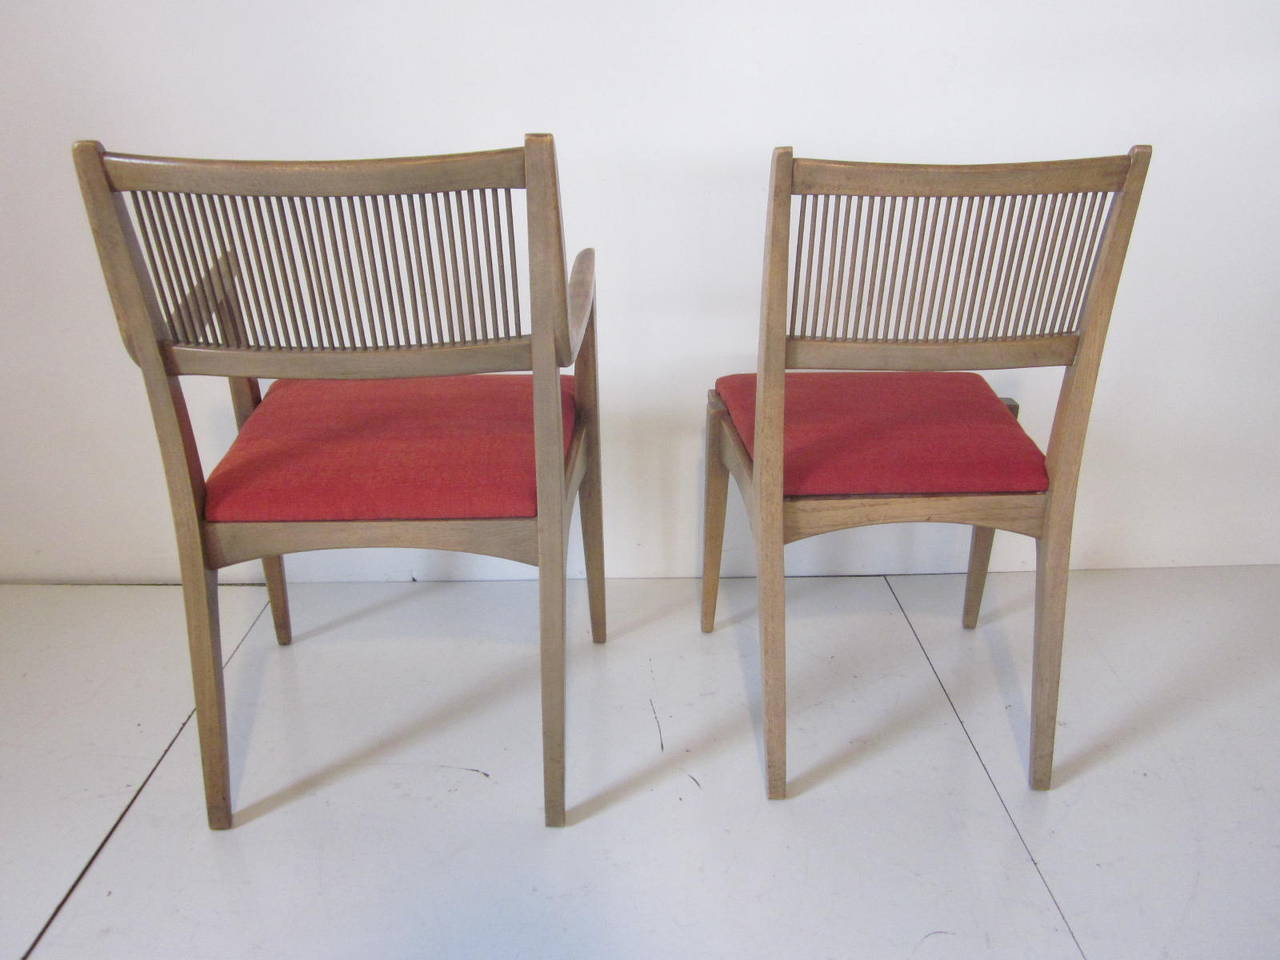 drexel dining chairs designed by john van koert at 1stdibs